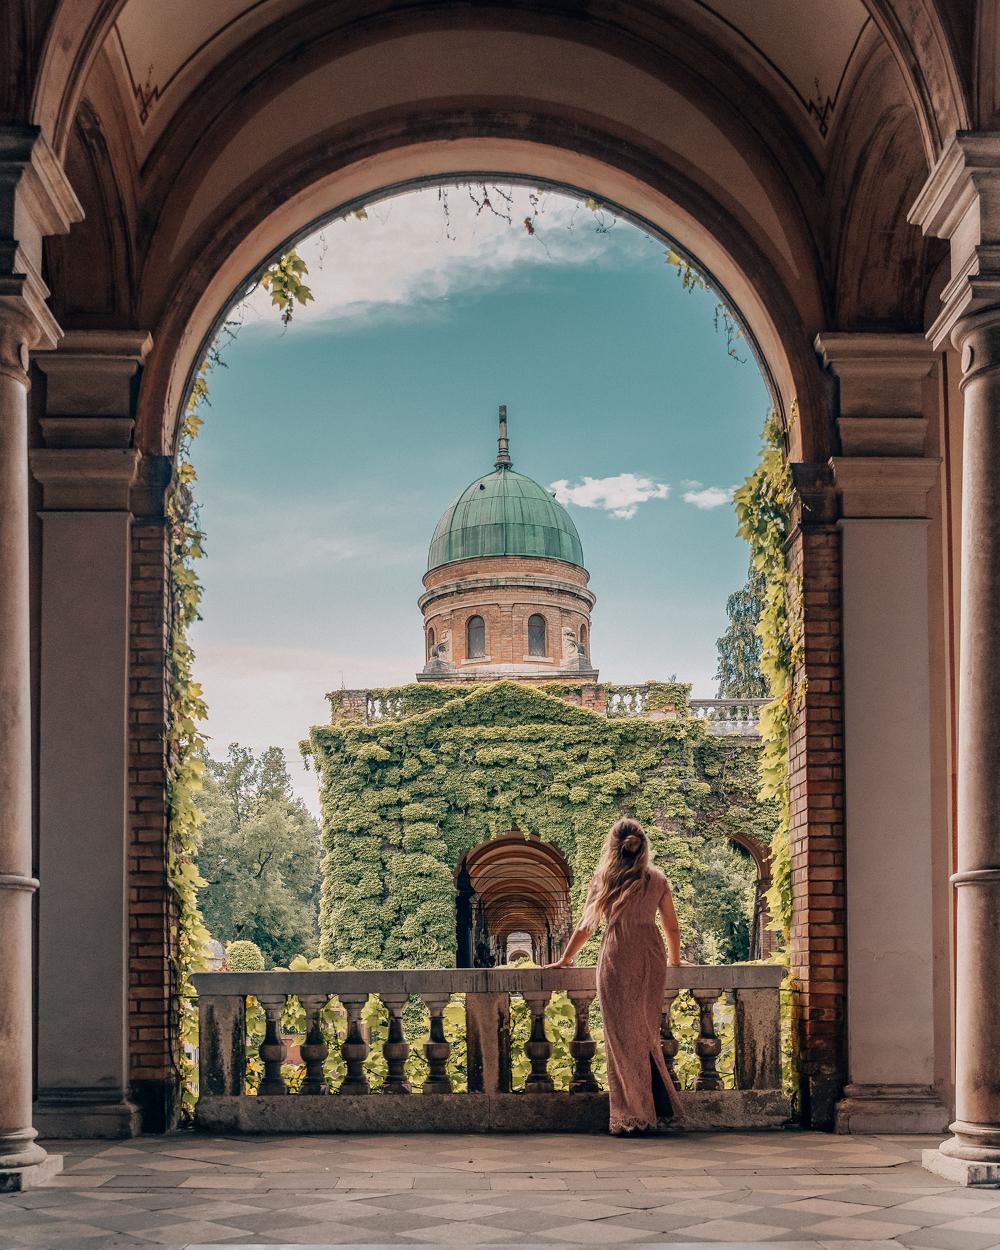 16 Best Things To Do In Zagreb Croatia In 2020 Croatia Travel Croatia Travel Guide Zagreb Croatia